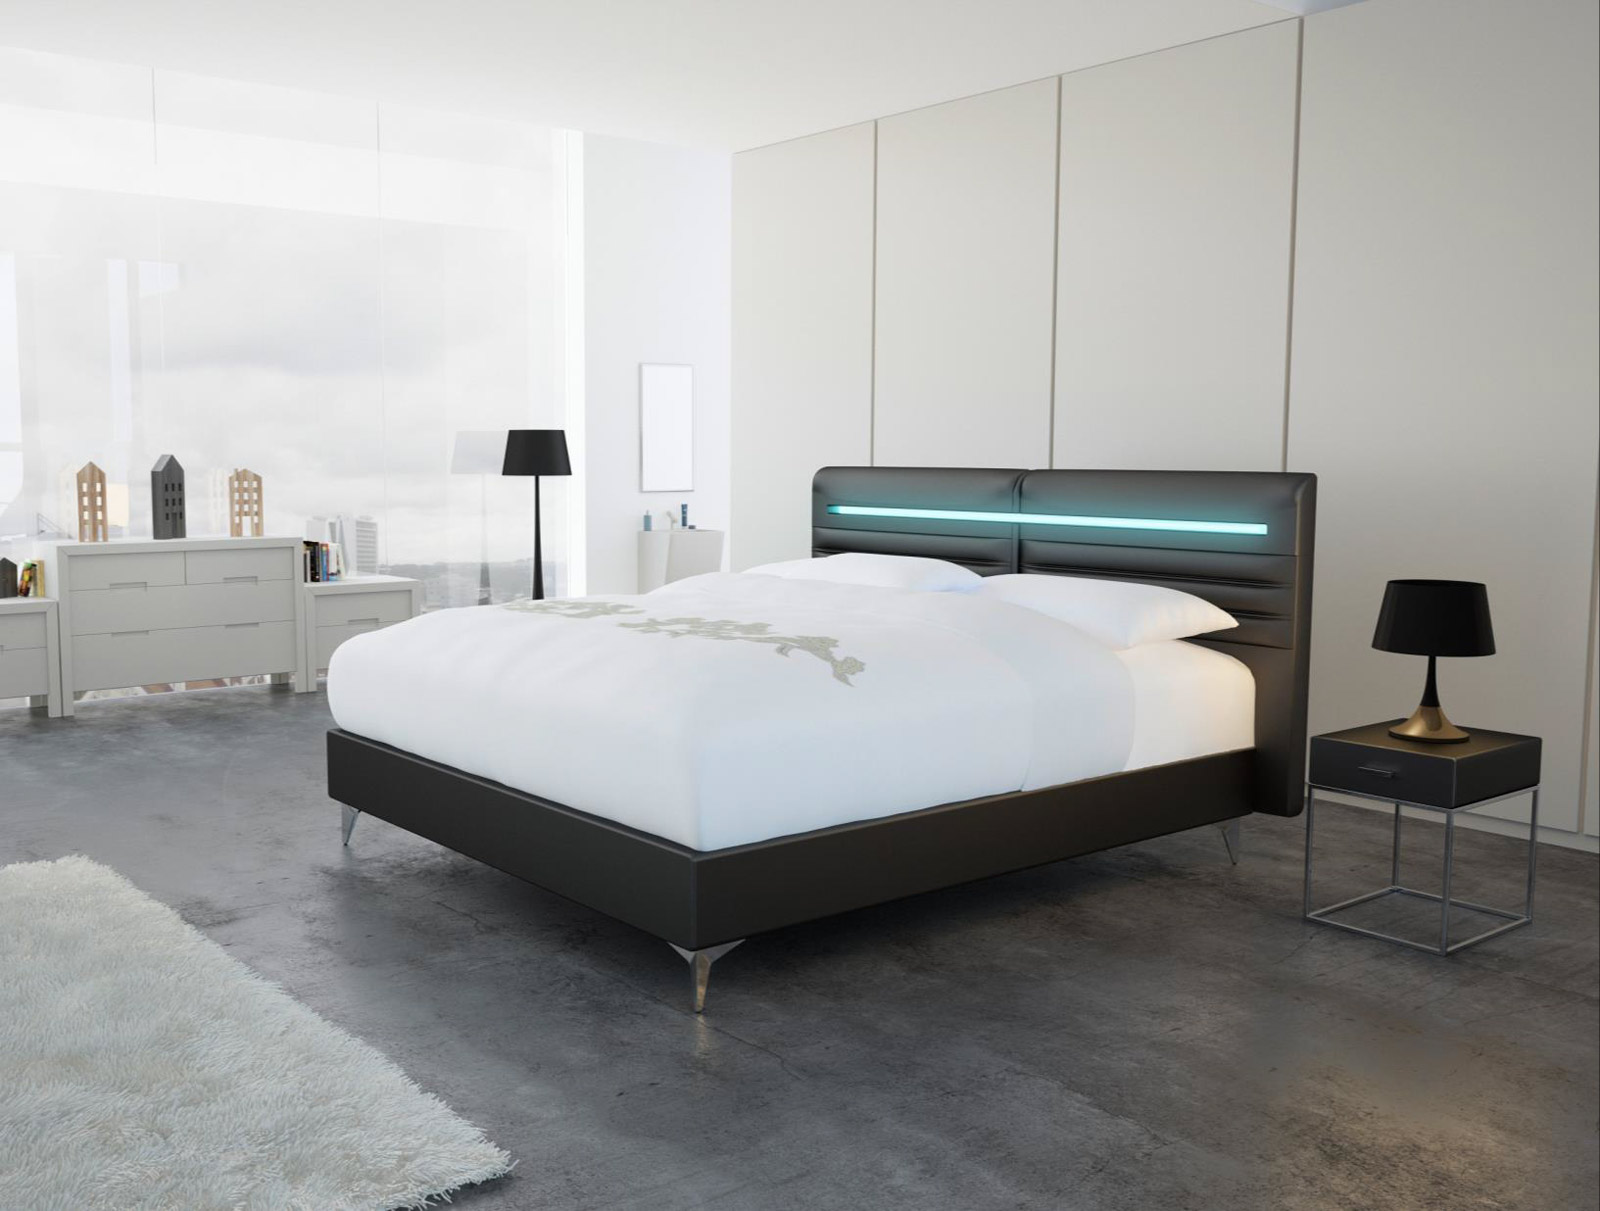 sam design boxspringbett 140 x 200 cm schwarz abbadon luciano. Black Bedroom Furniture Sets. Home Design Ideas